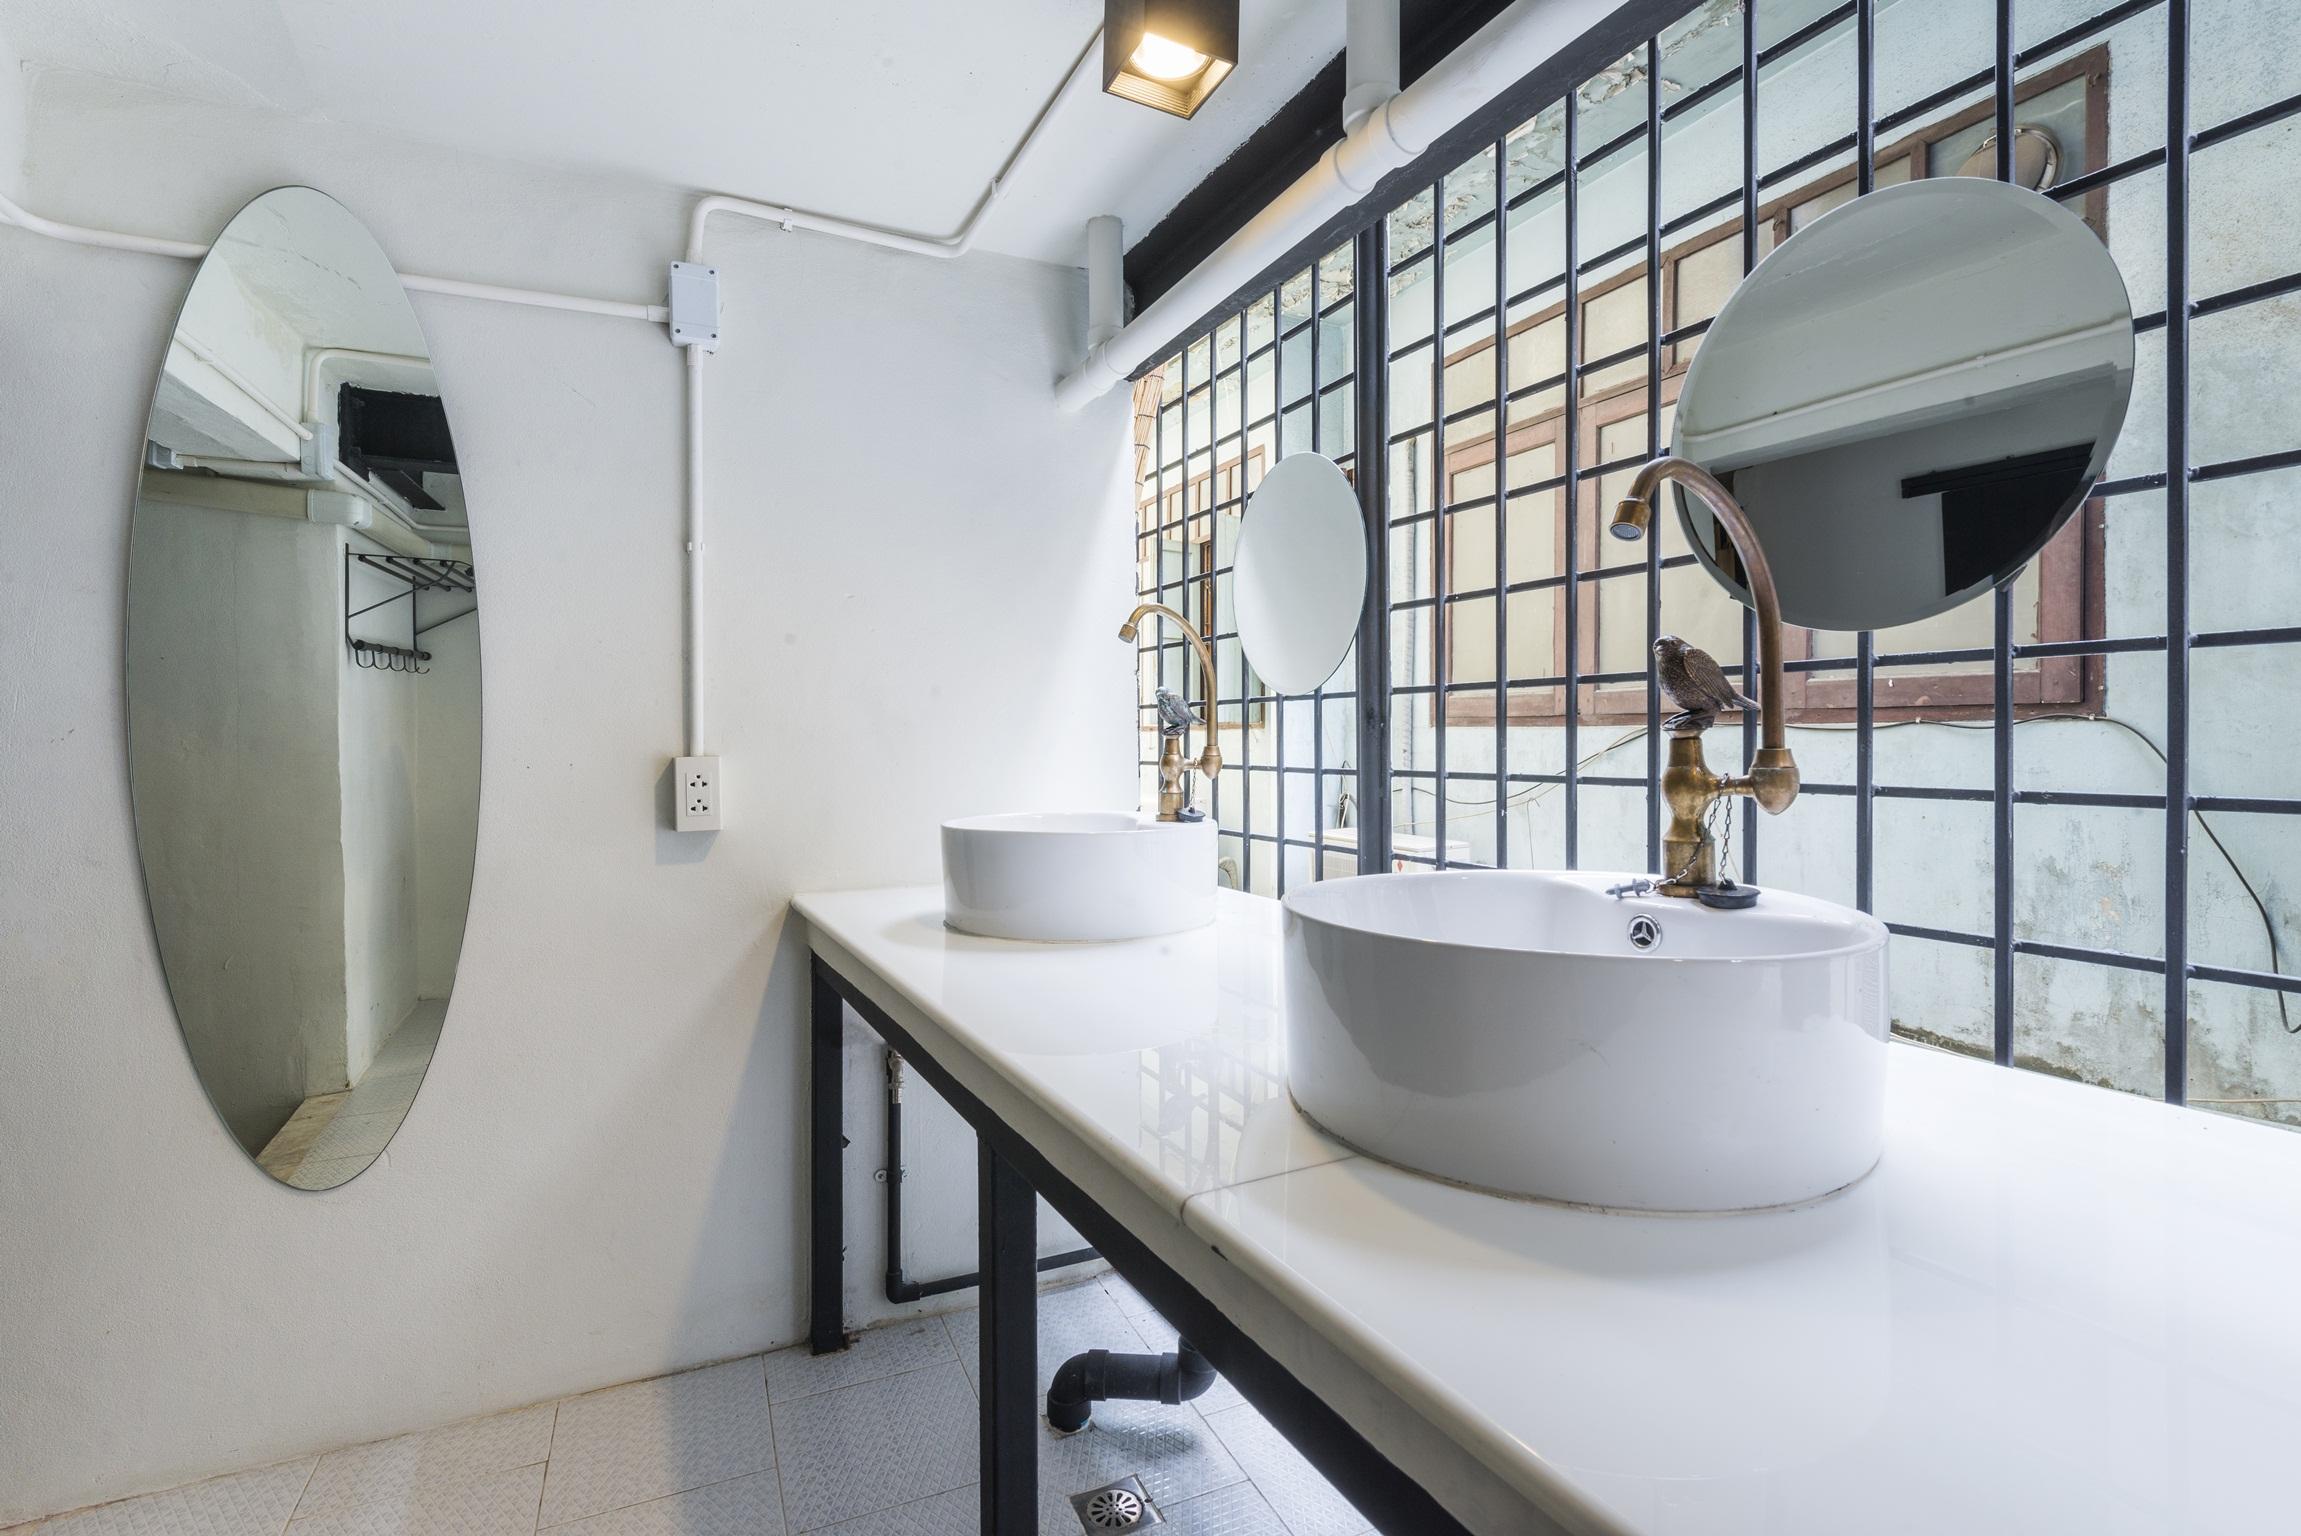 Lady Dorm Bathroom 2